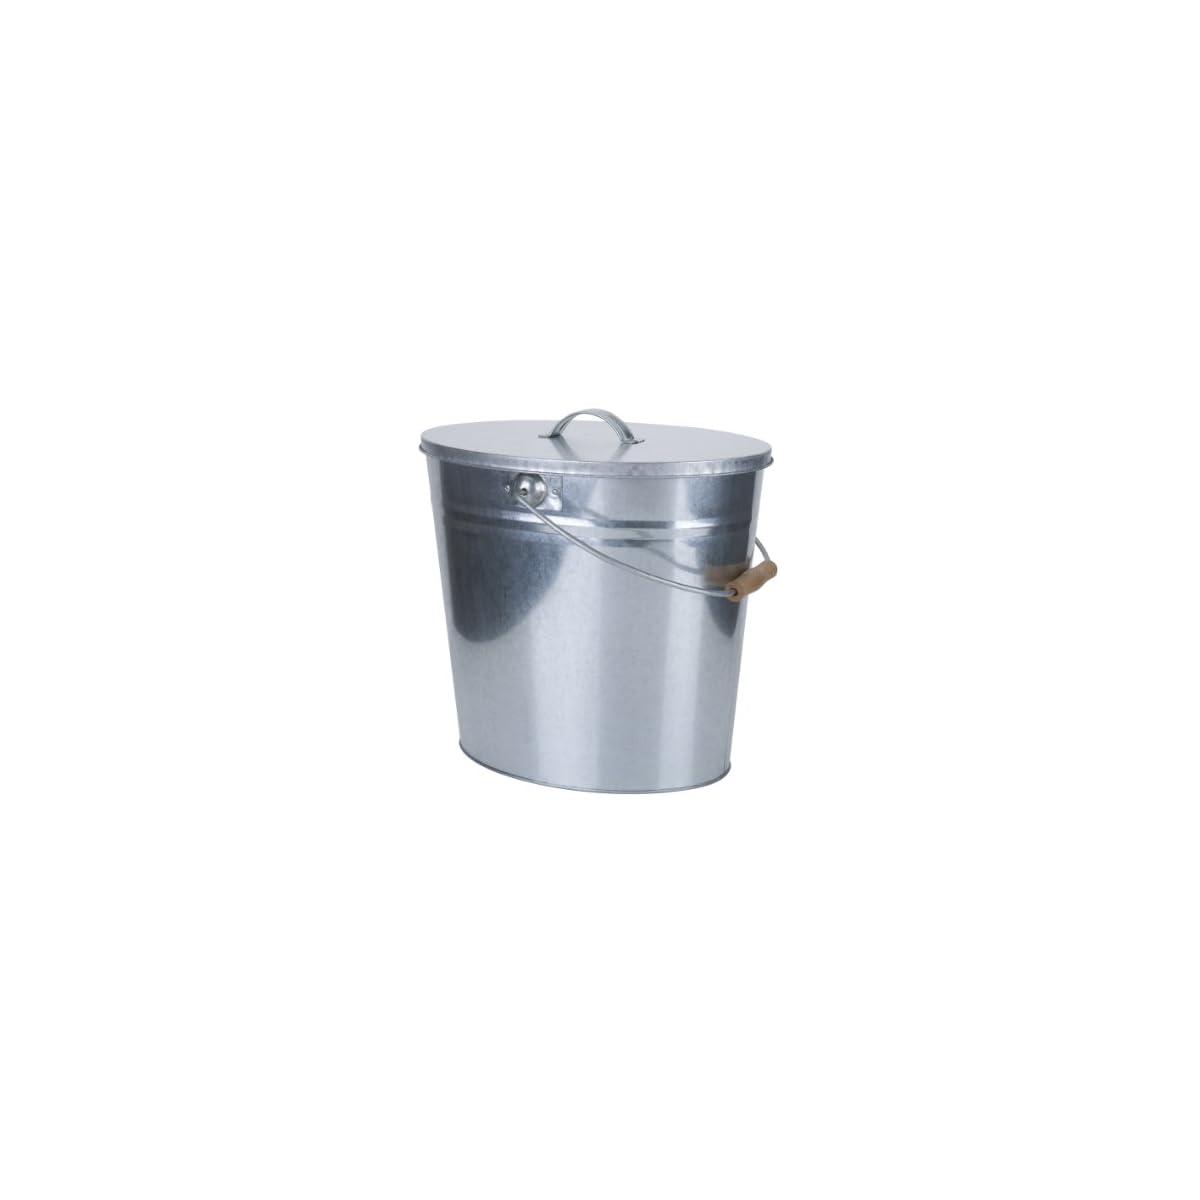 41woJibr5RL. SS1200  - Kamino-Flam-Cubo para carbón (galvanizado, 24L con tapa